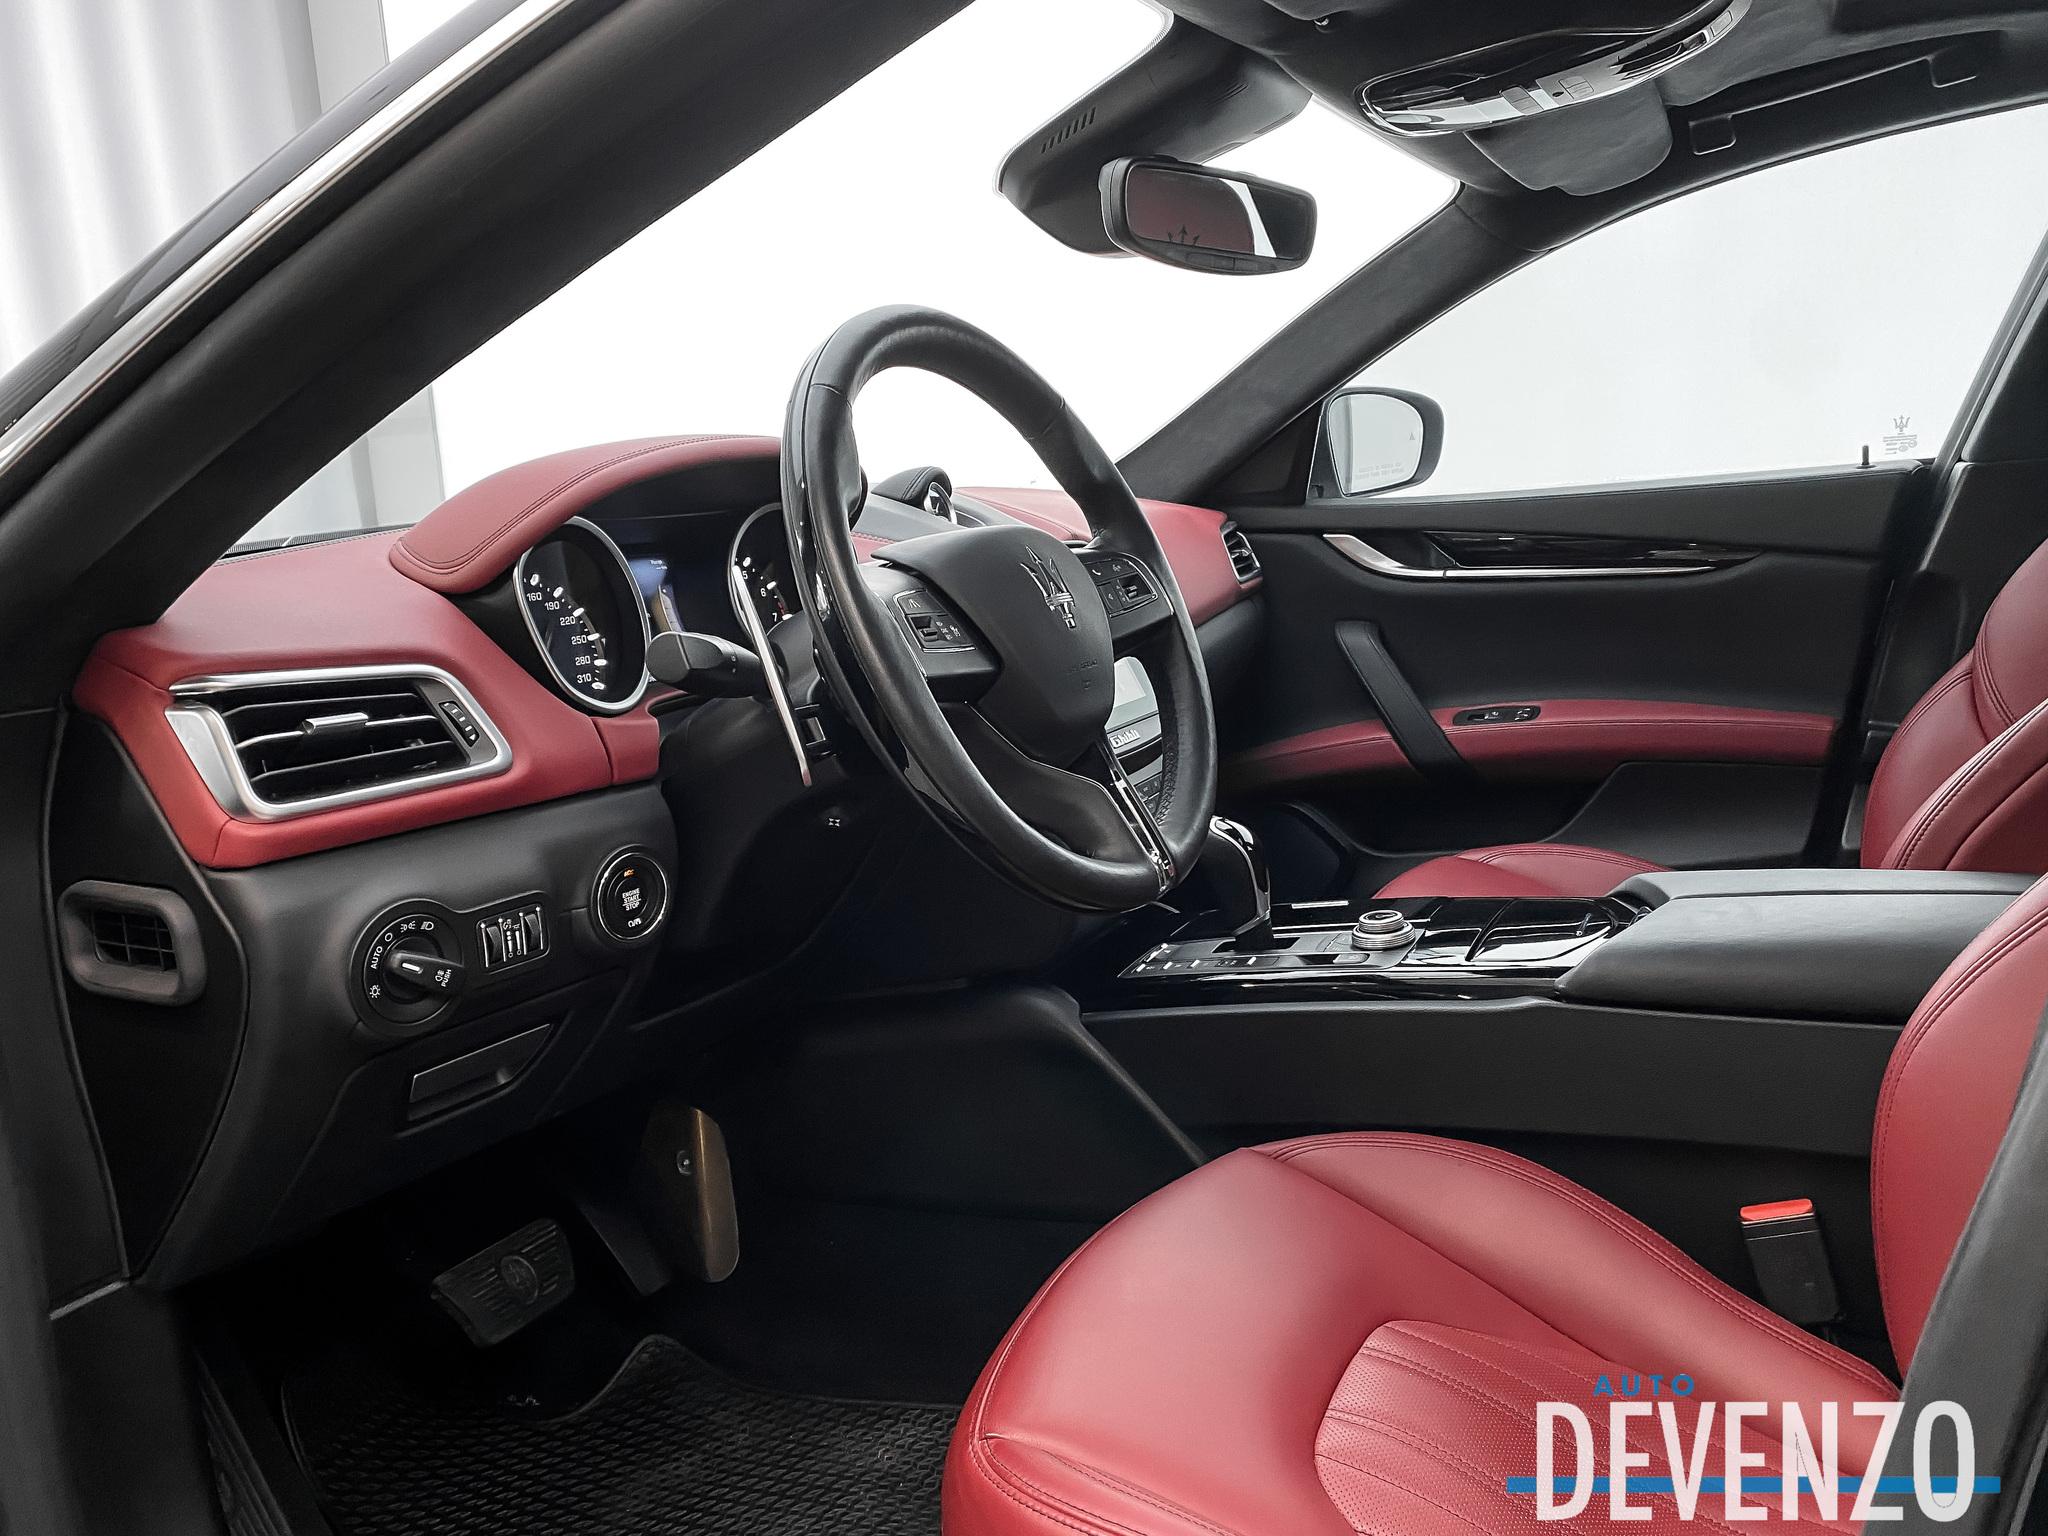 2017 Maserati Ghibli S Q4 3.0L Sport Package / Driver Assist complet